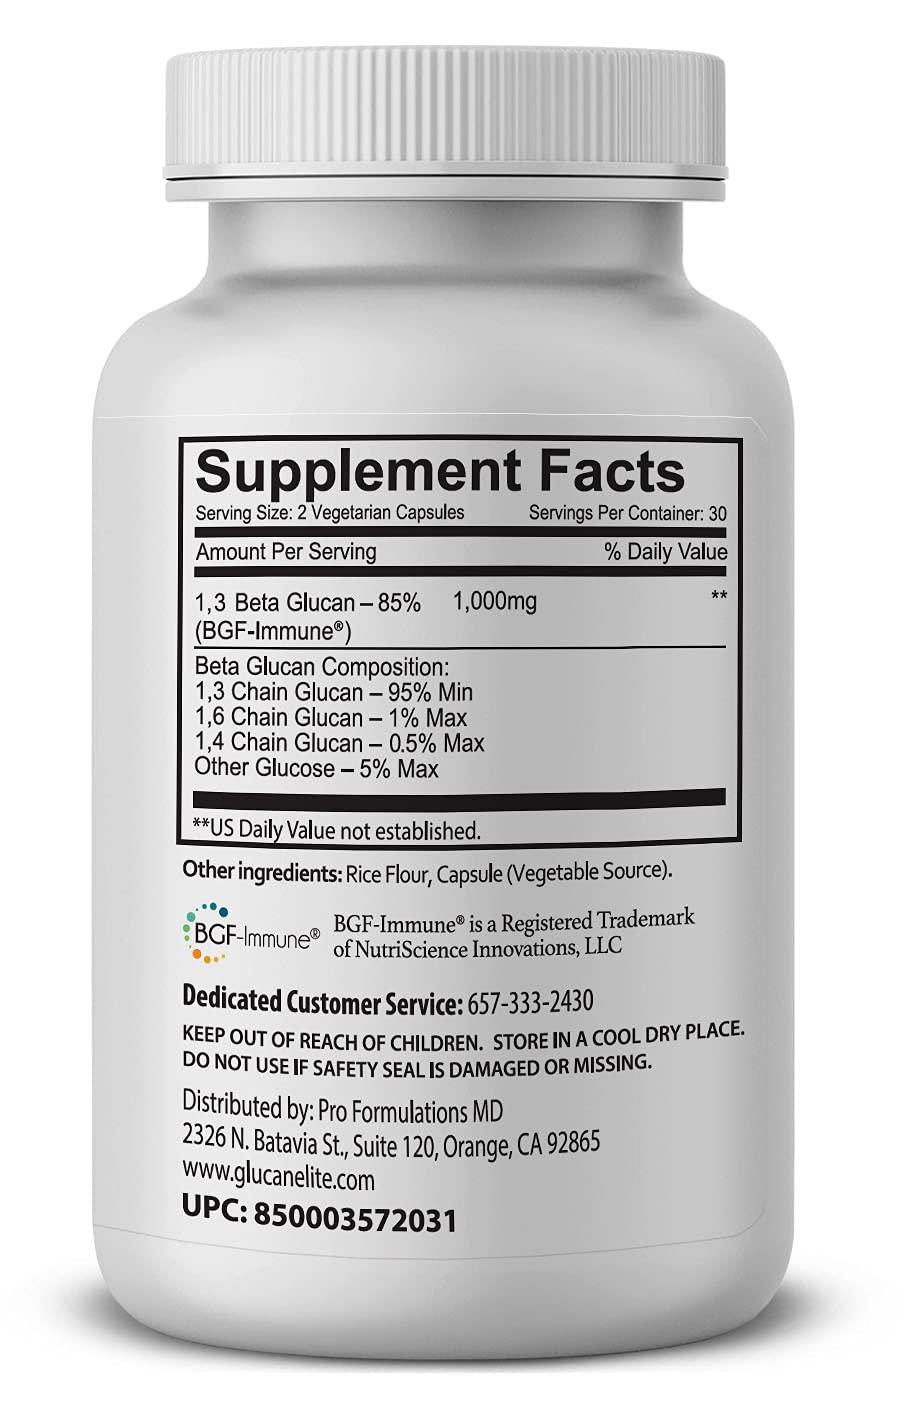 Glucan Elite – 85% Beta 1,3D Glucan 500mg - 60 vcaps - Ultra-Potency Beta Glucan – Highest Bioavailability with BGF-Immune - Superior Immune System Support